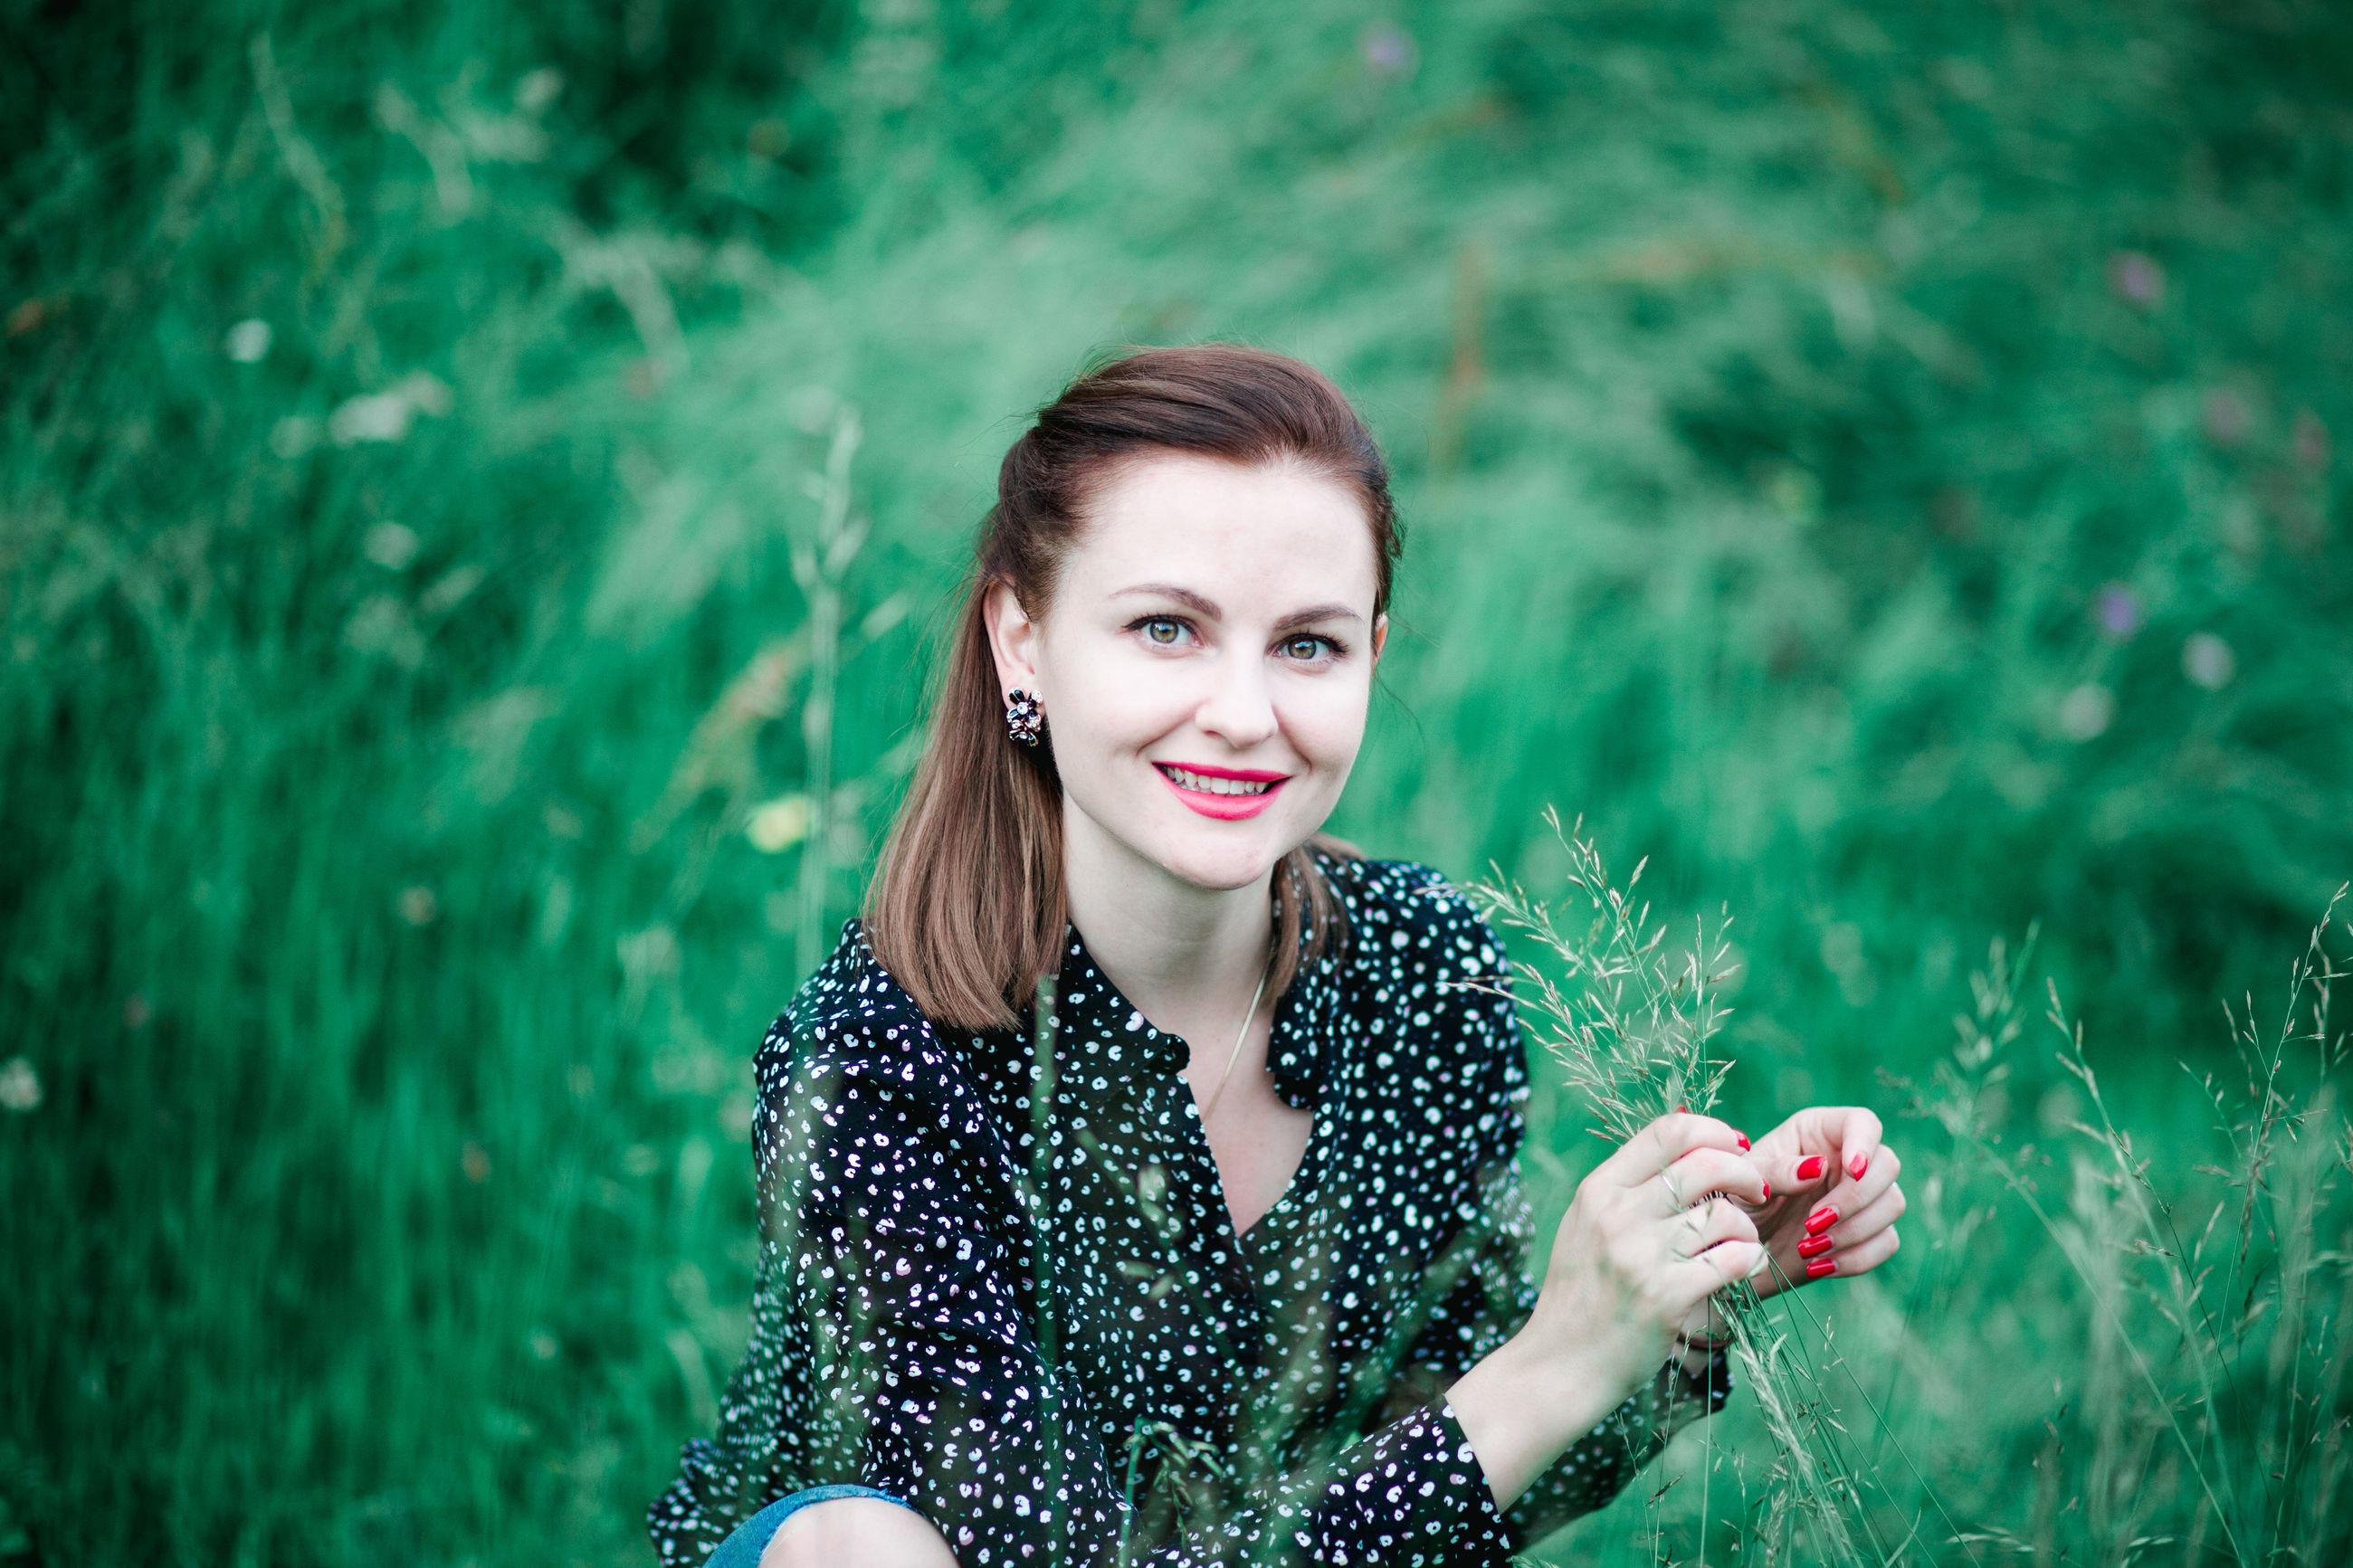 Portrait of smiling beautiful woman sitting amidst plants